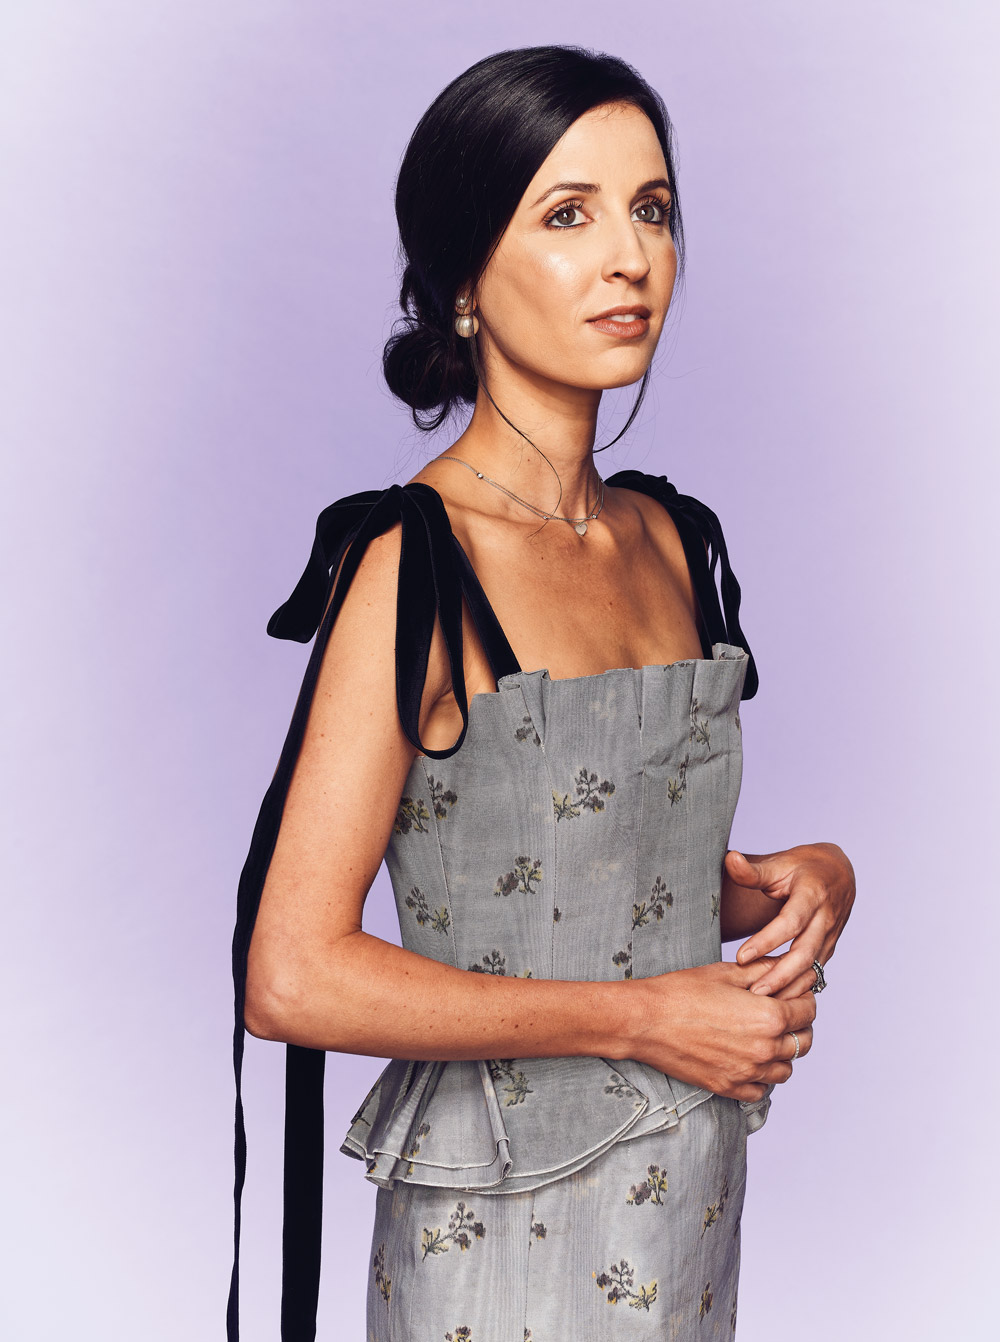 My Style: Alexandra Dillard Lucie wears a silver, floral dress